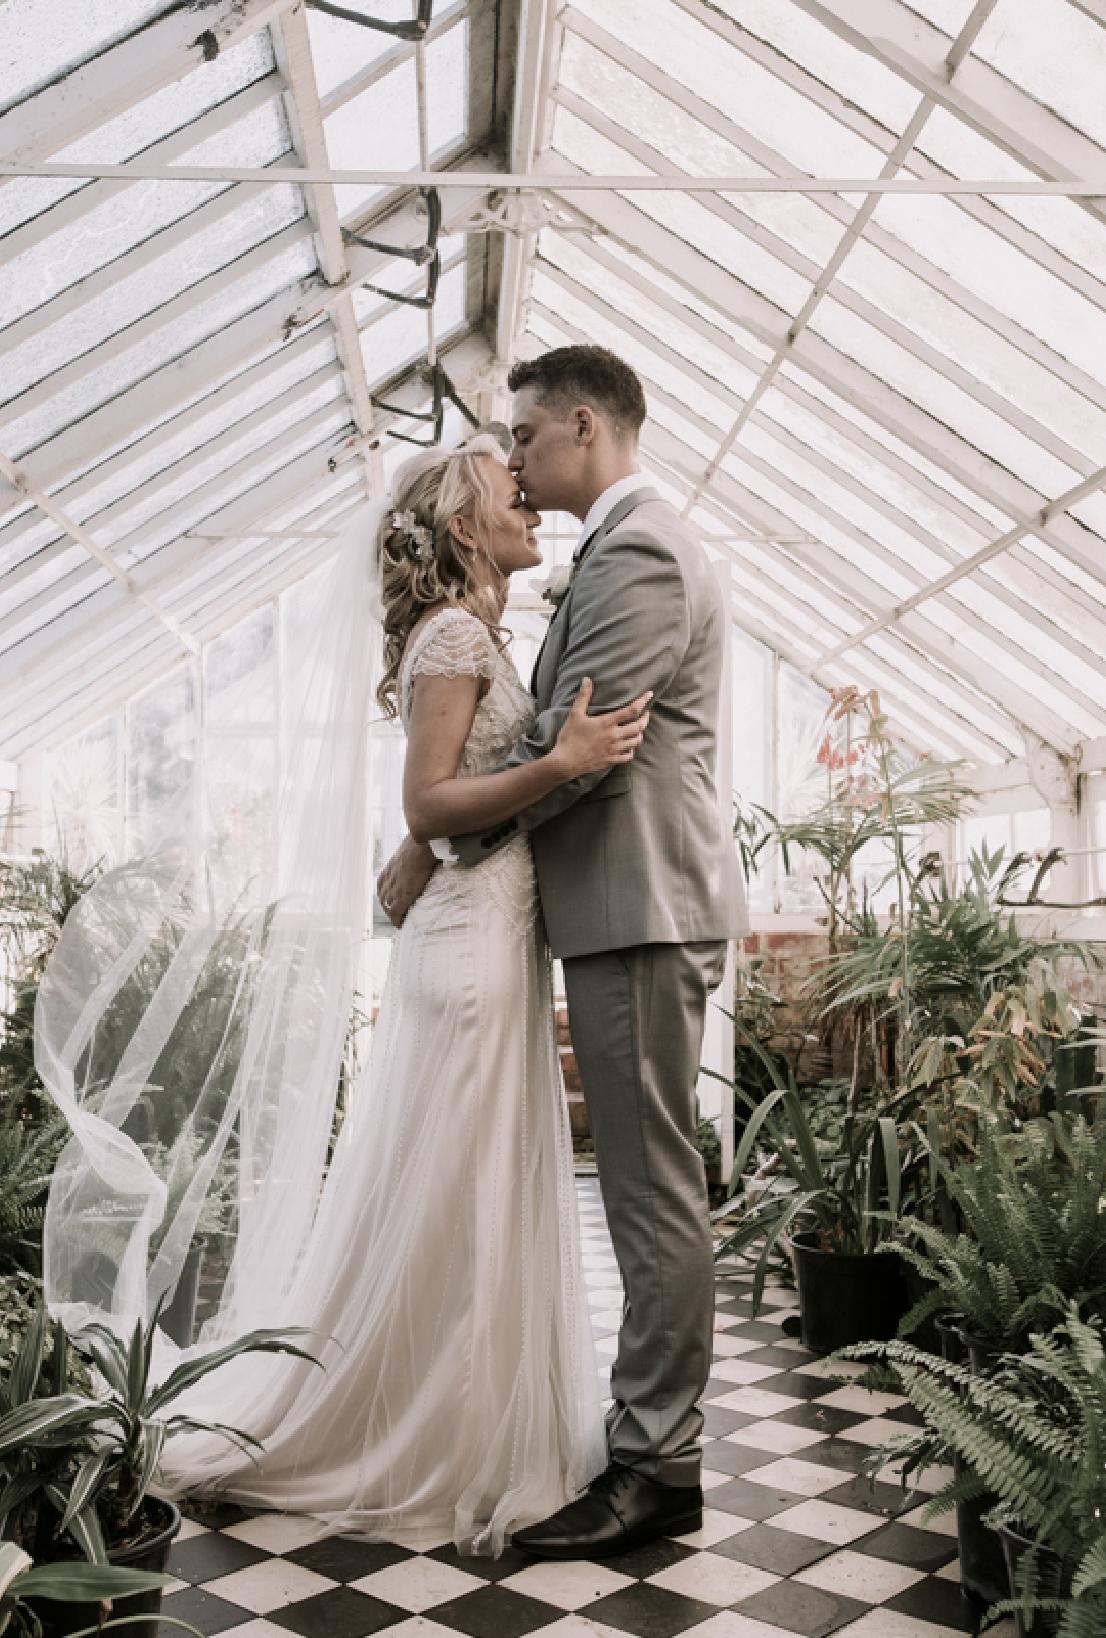 wedding dress vintage,wedding dresses vintage,vintage wedding dress,wedding dresses vintage,wedding dresses vintage,wedding dresses vintage,